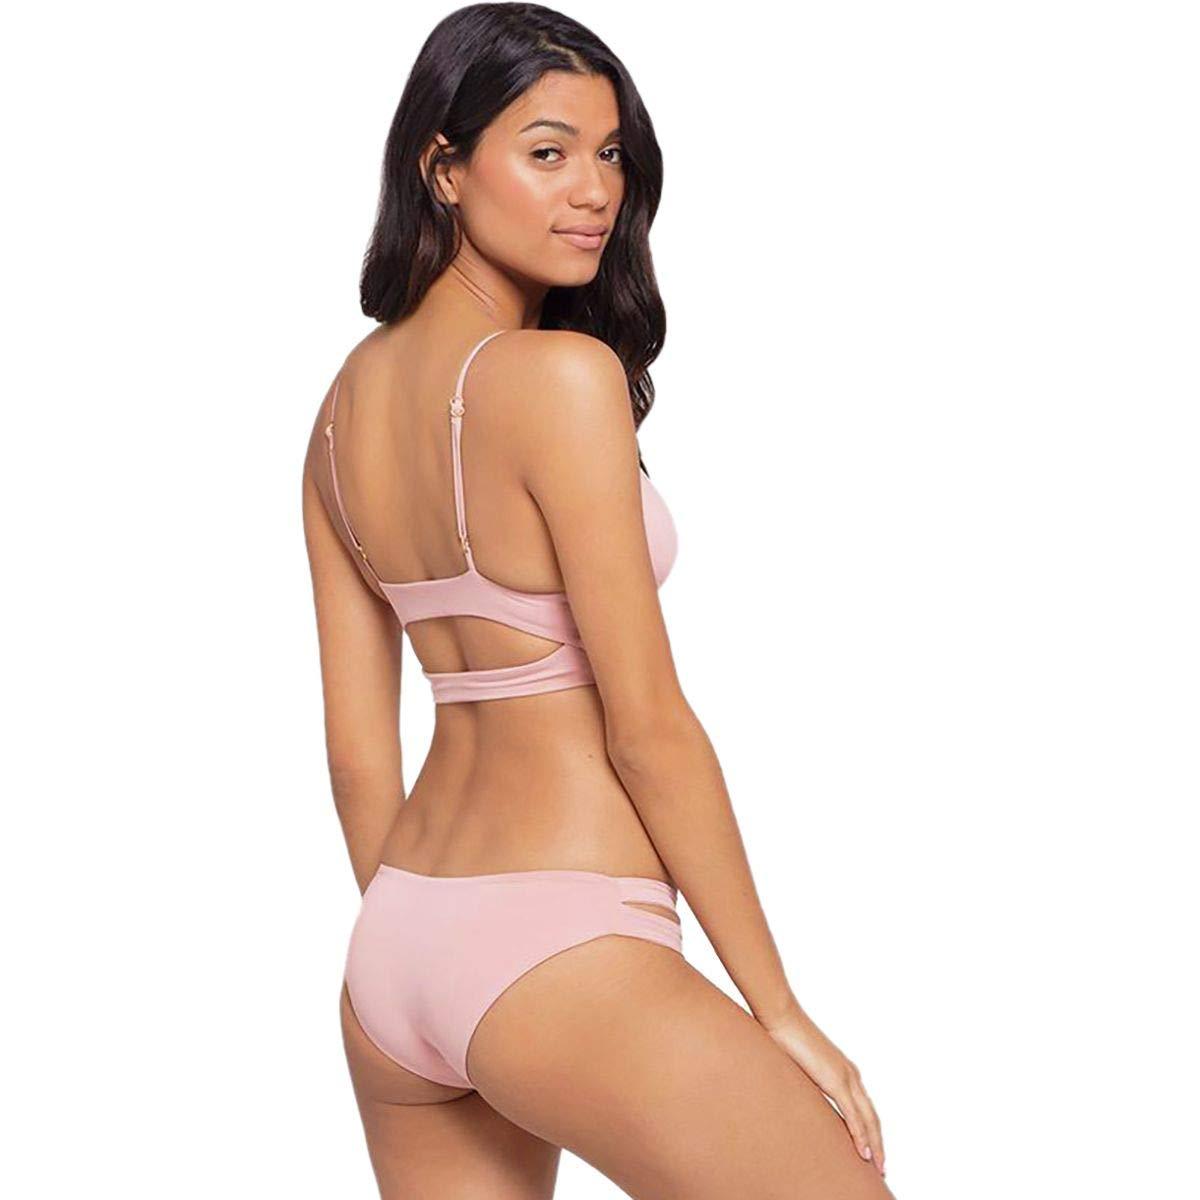 bd208ff8262ed5 Amazon.com: LSpace Women's Estella Classic Fit Cut Out Bikini Bottom:  L*Space: Clothing